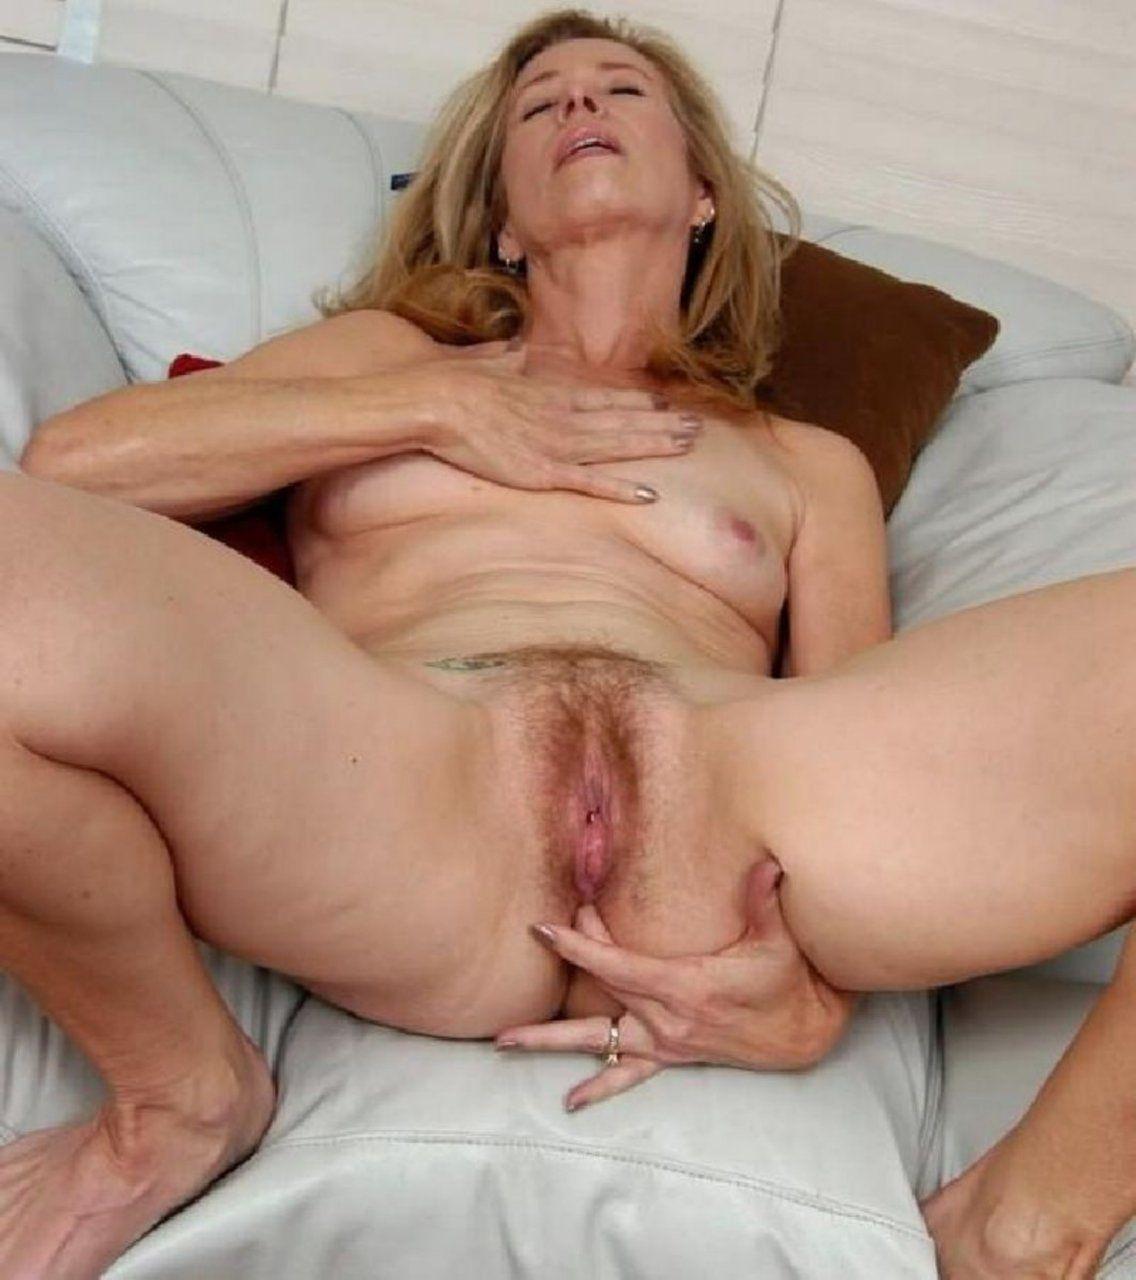 seks-s-pozhilimi-hudimi